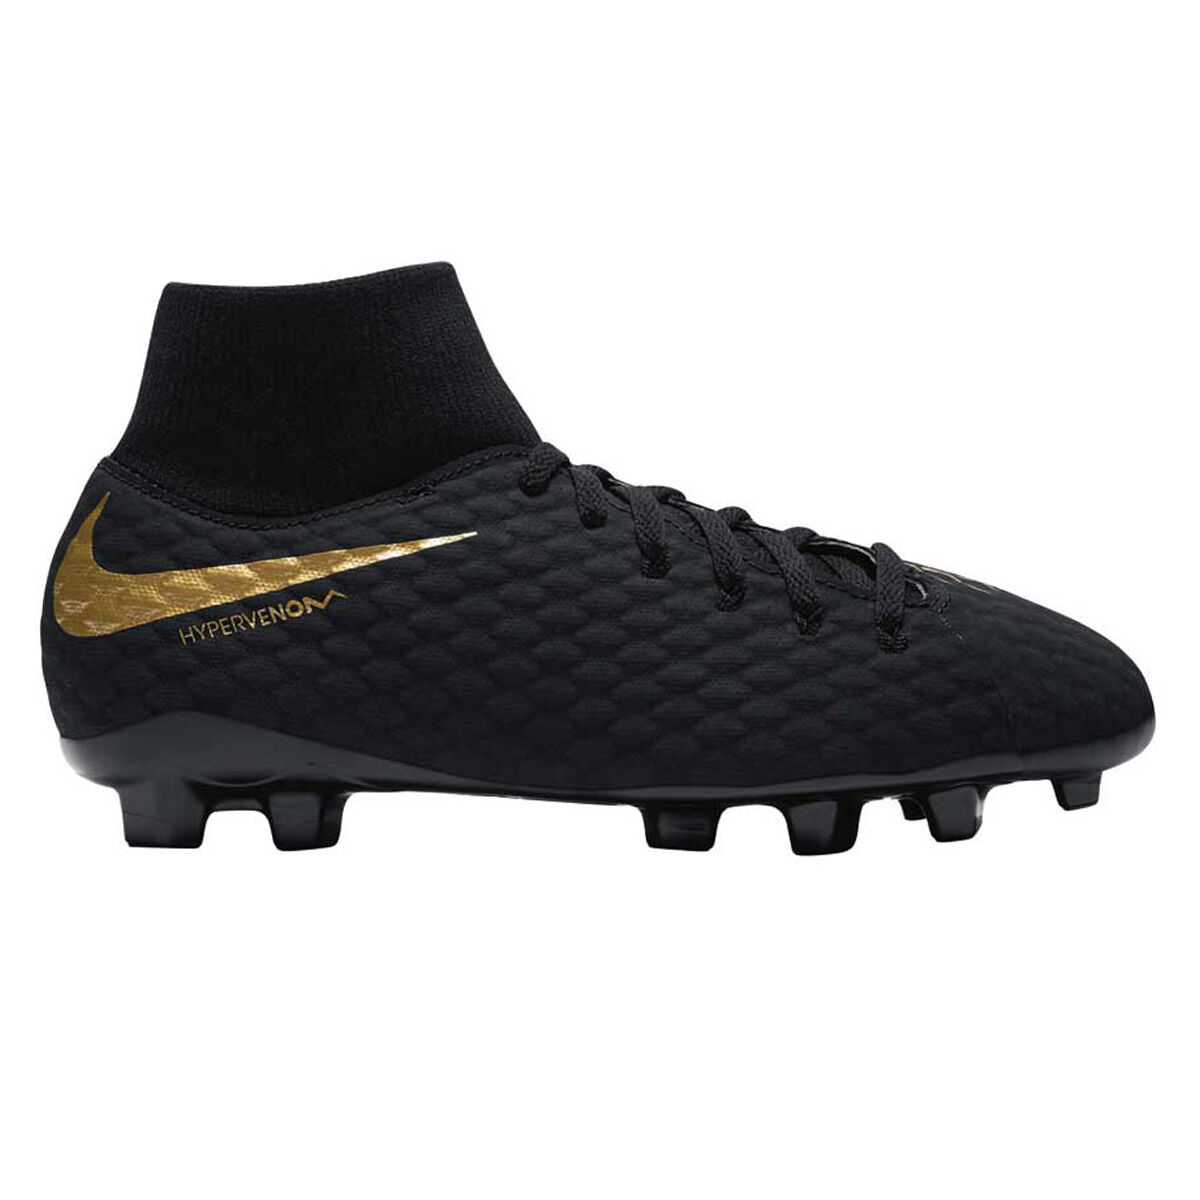 Nike Hypervenom Phantom III Academy Kids Football Boots